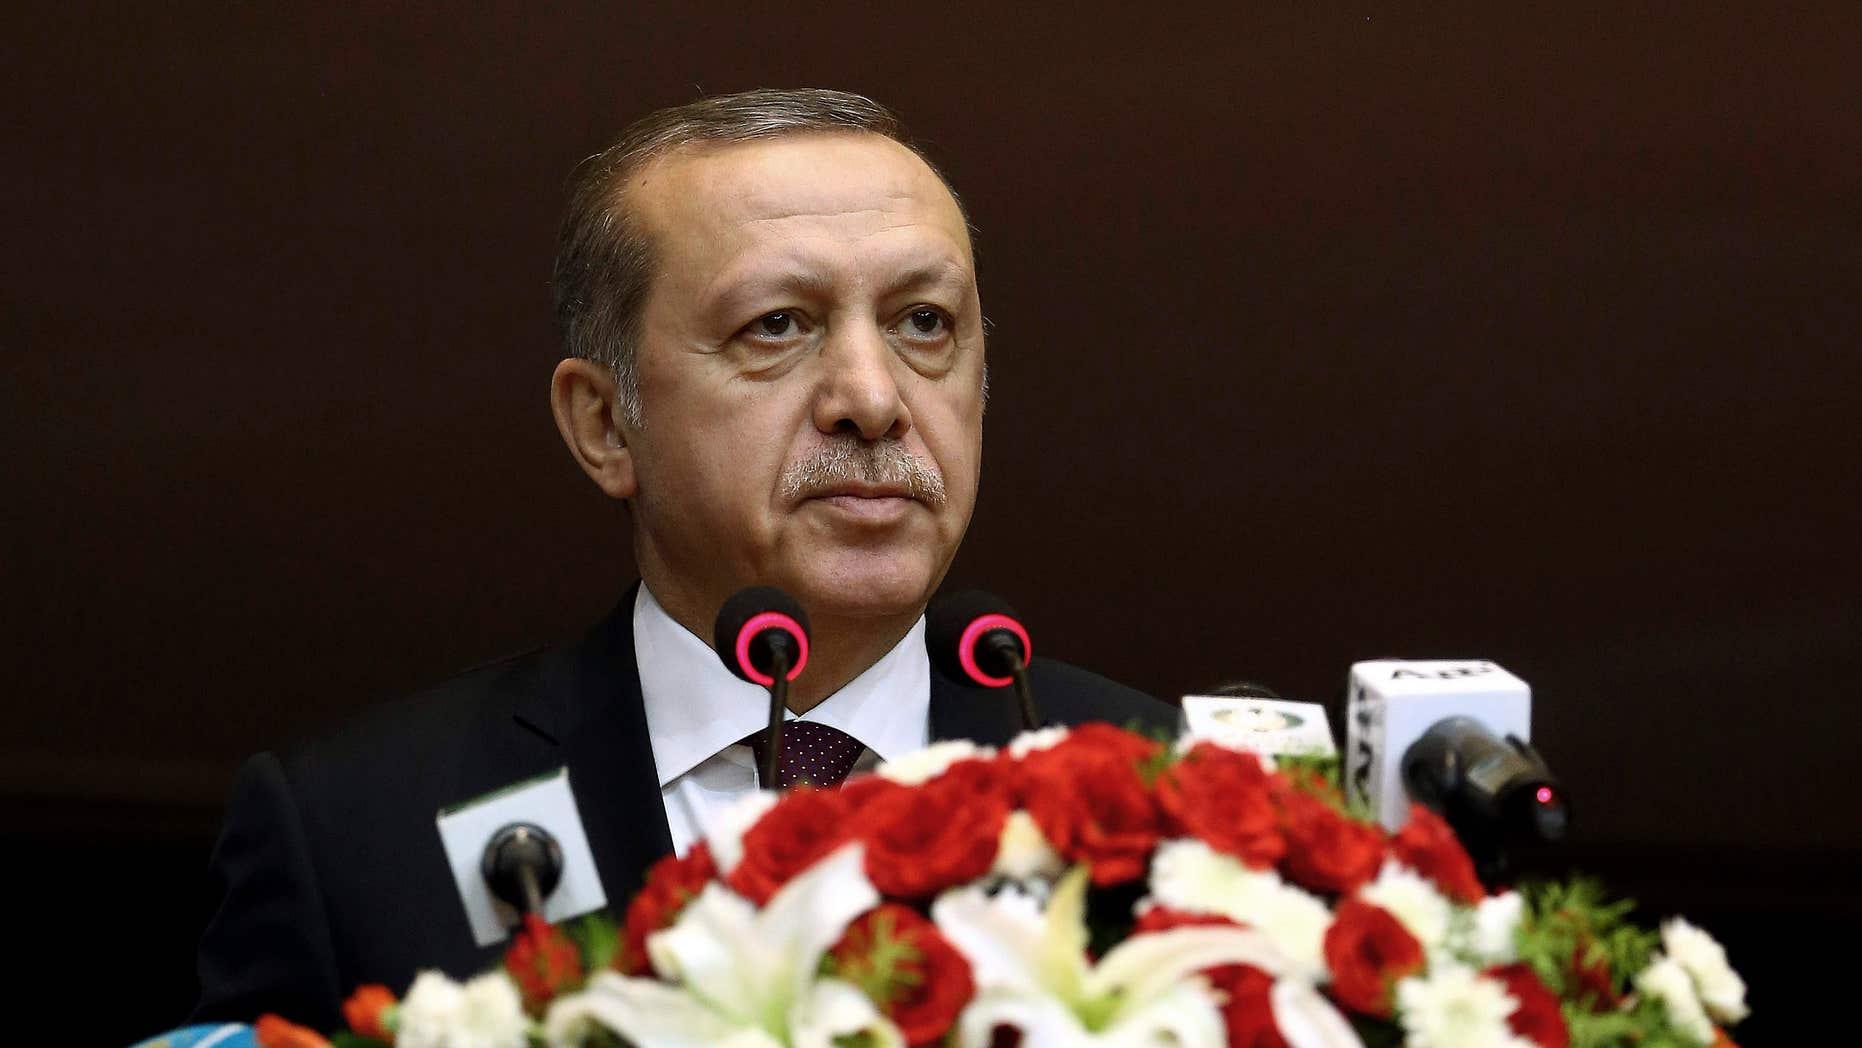 Nov. 17, 2016: Turkey's President Recep Tayyip Erdogan addresses the parliament in Islamabad, Pakistan.